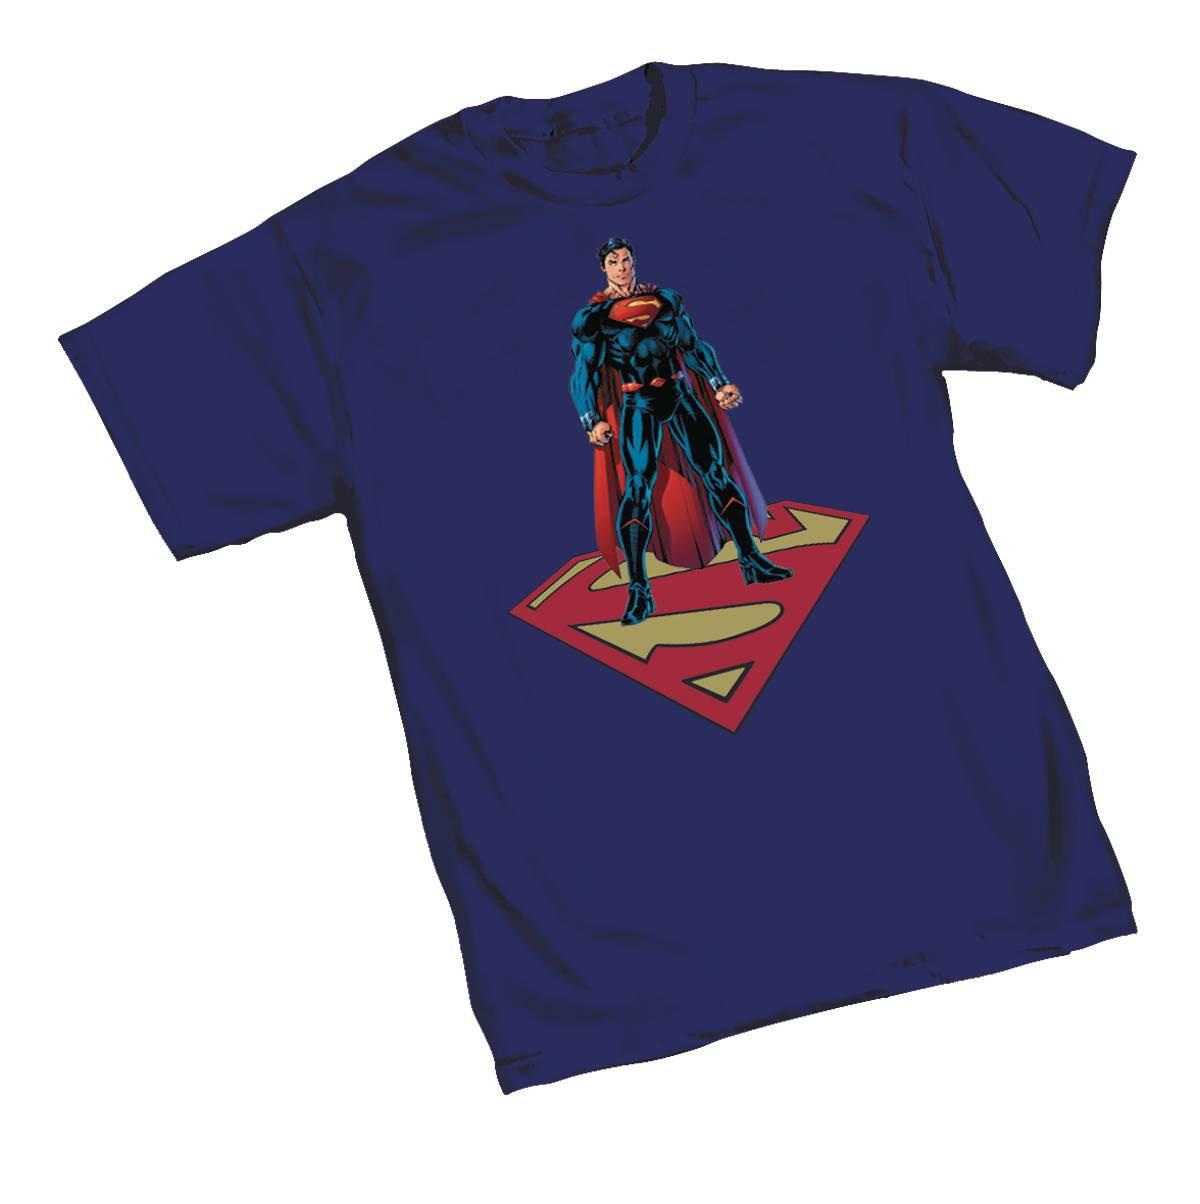 SUPERMAN REBIRTH BY LEE T/S LG (C: 1-1-0)